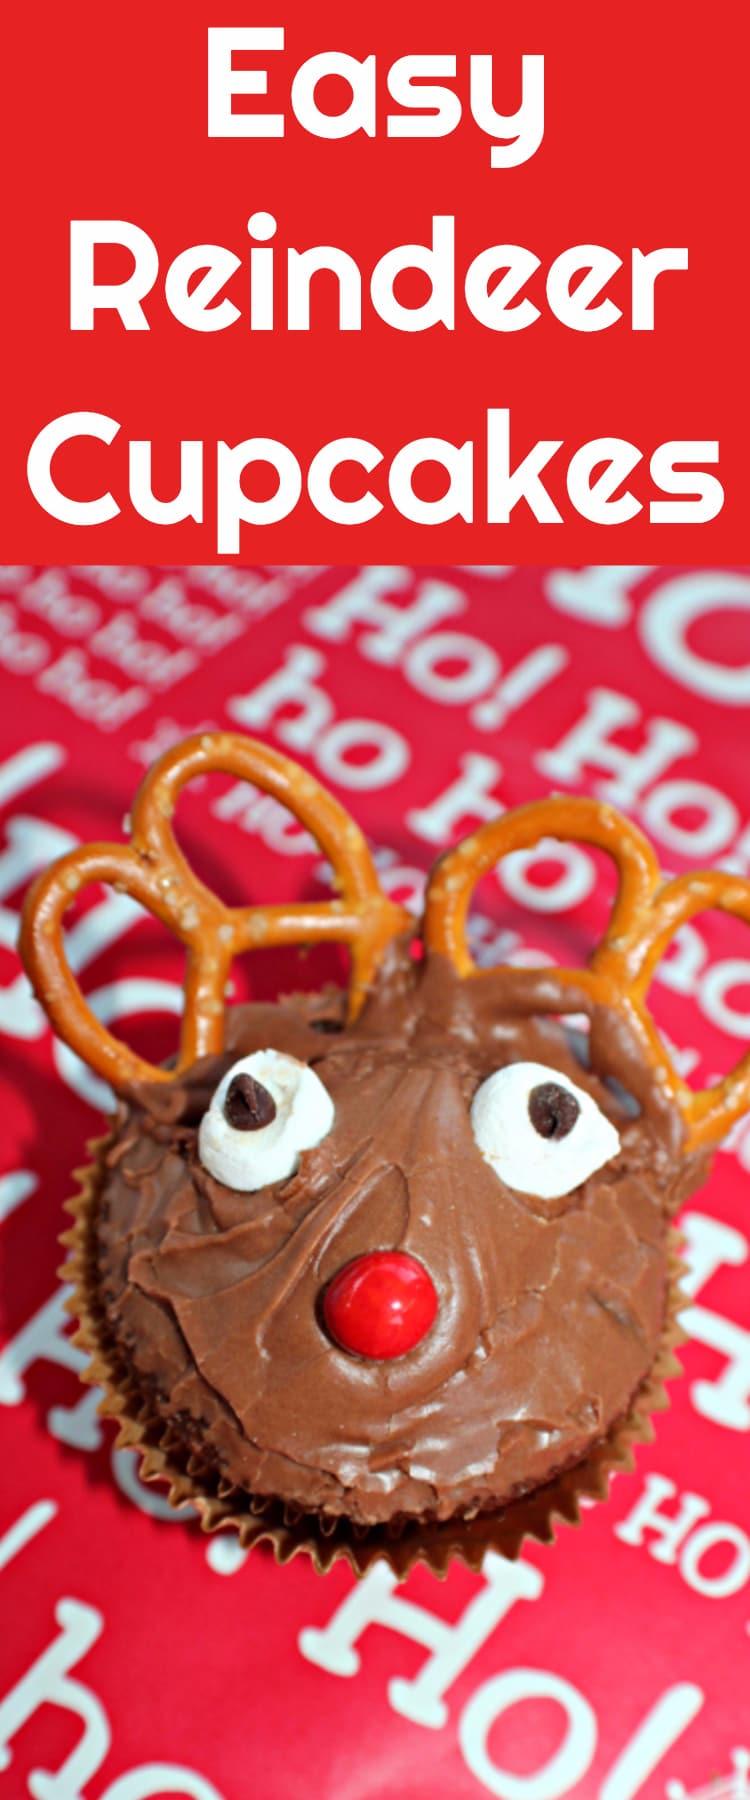 Reindeer Cupcakes / Reindeer Cupcakes / Christmas Class room party / Christmas Dessert / Easy Christmas Cupcakes #Cupcakes #Cupcake #Christmas